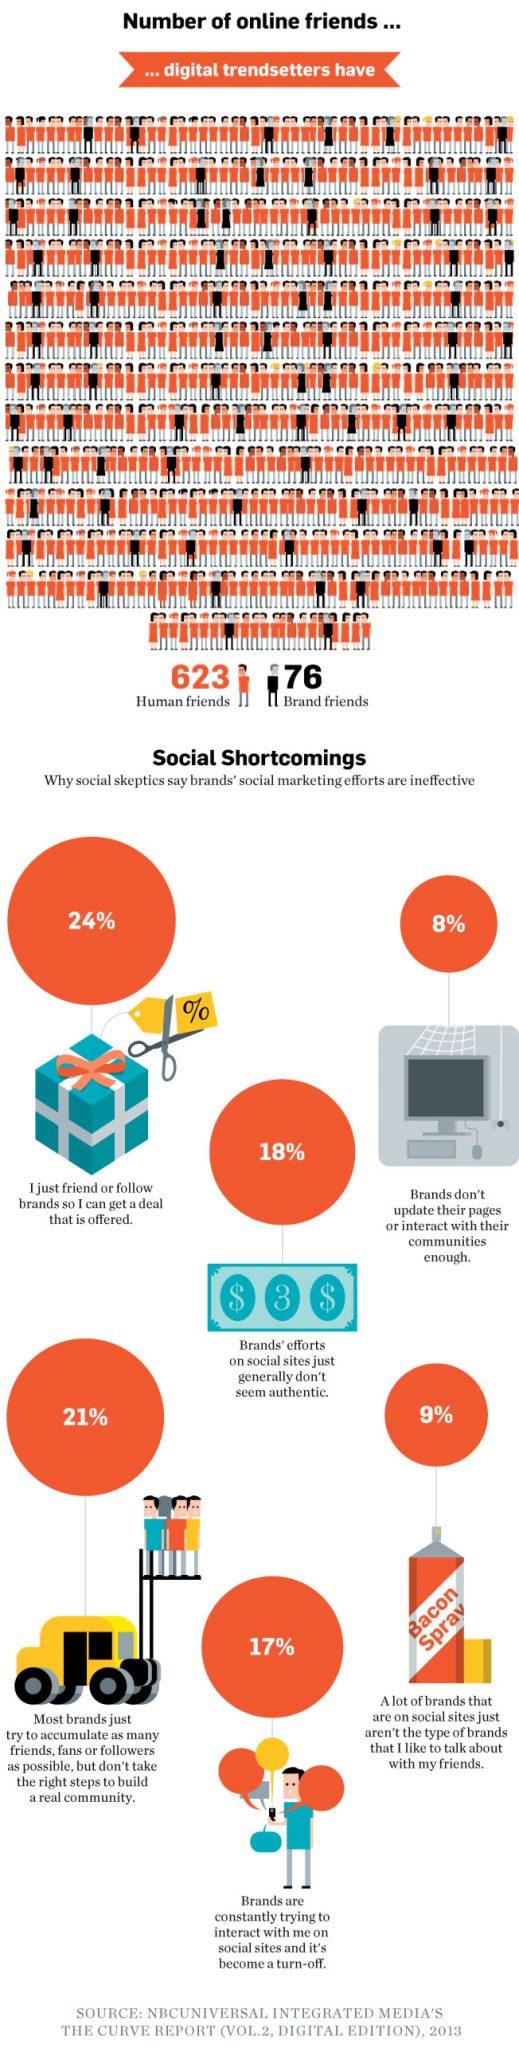 Social Media Brand Friend Stats